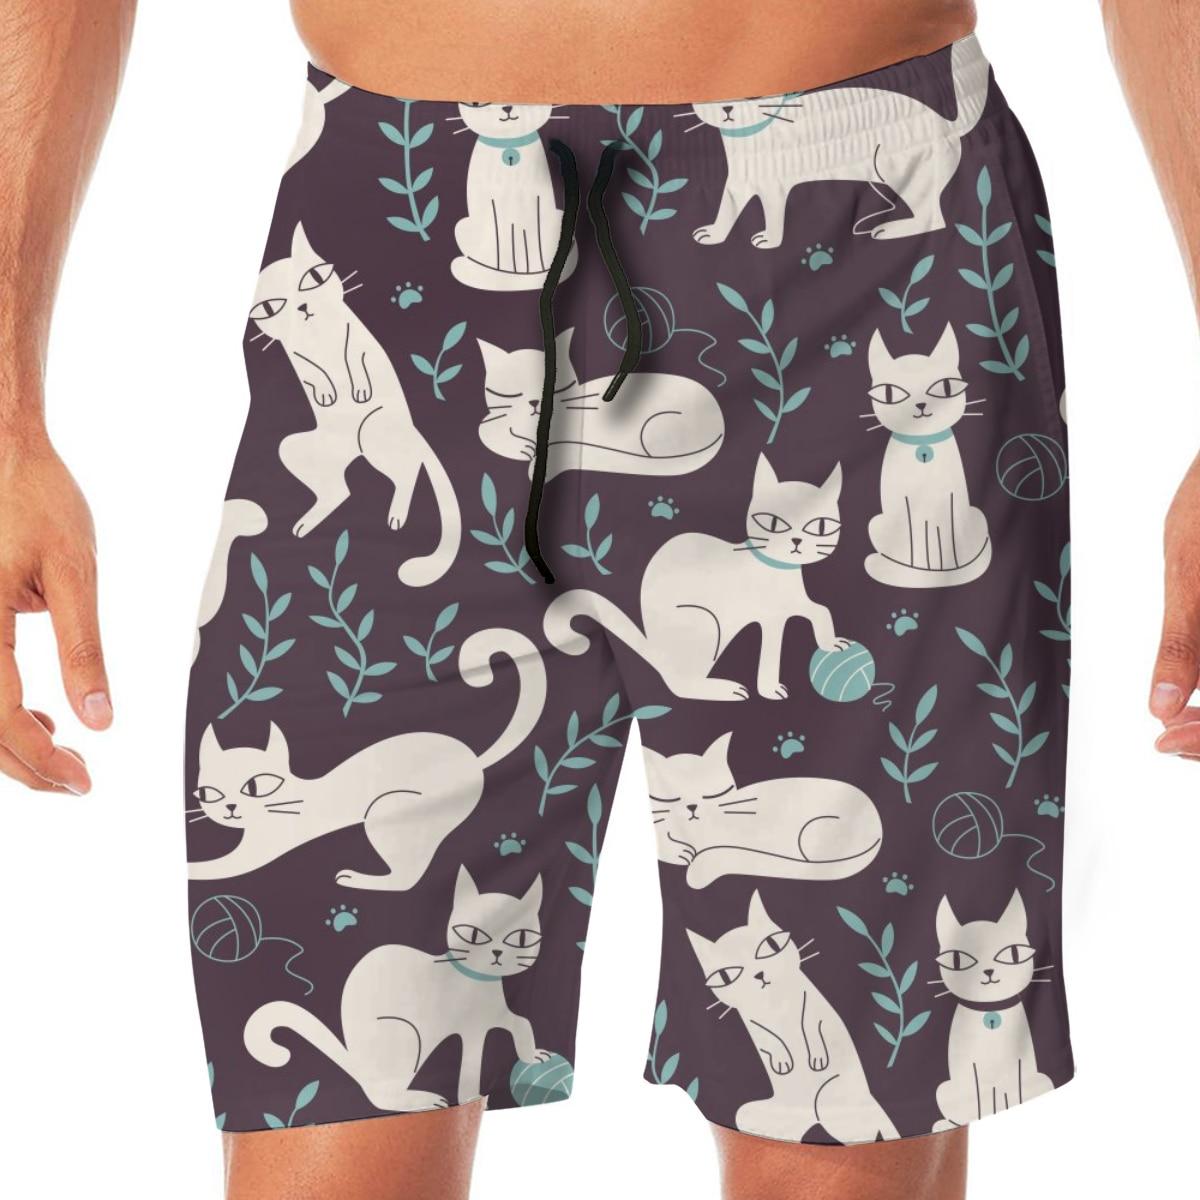 Cute Cats Purple Print Mens Swimsuit Swimwear Men Swimming Shorts Beach Short Sports Suits Surf Board Swim Trunks Beachwear